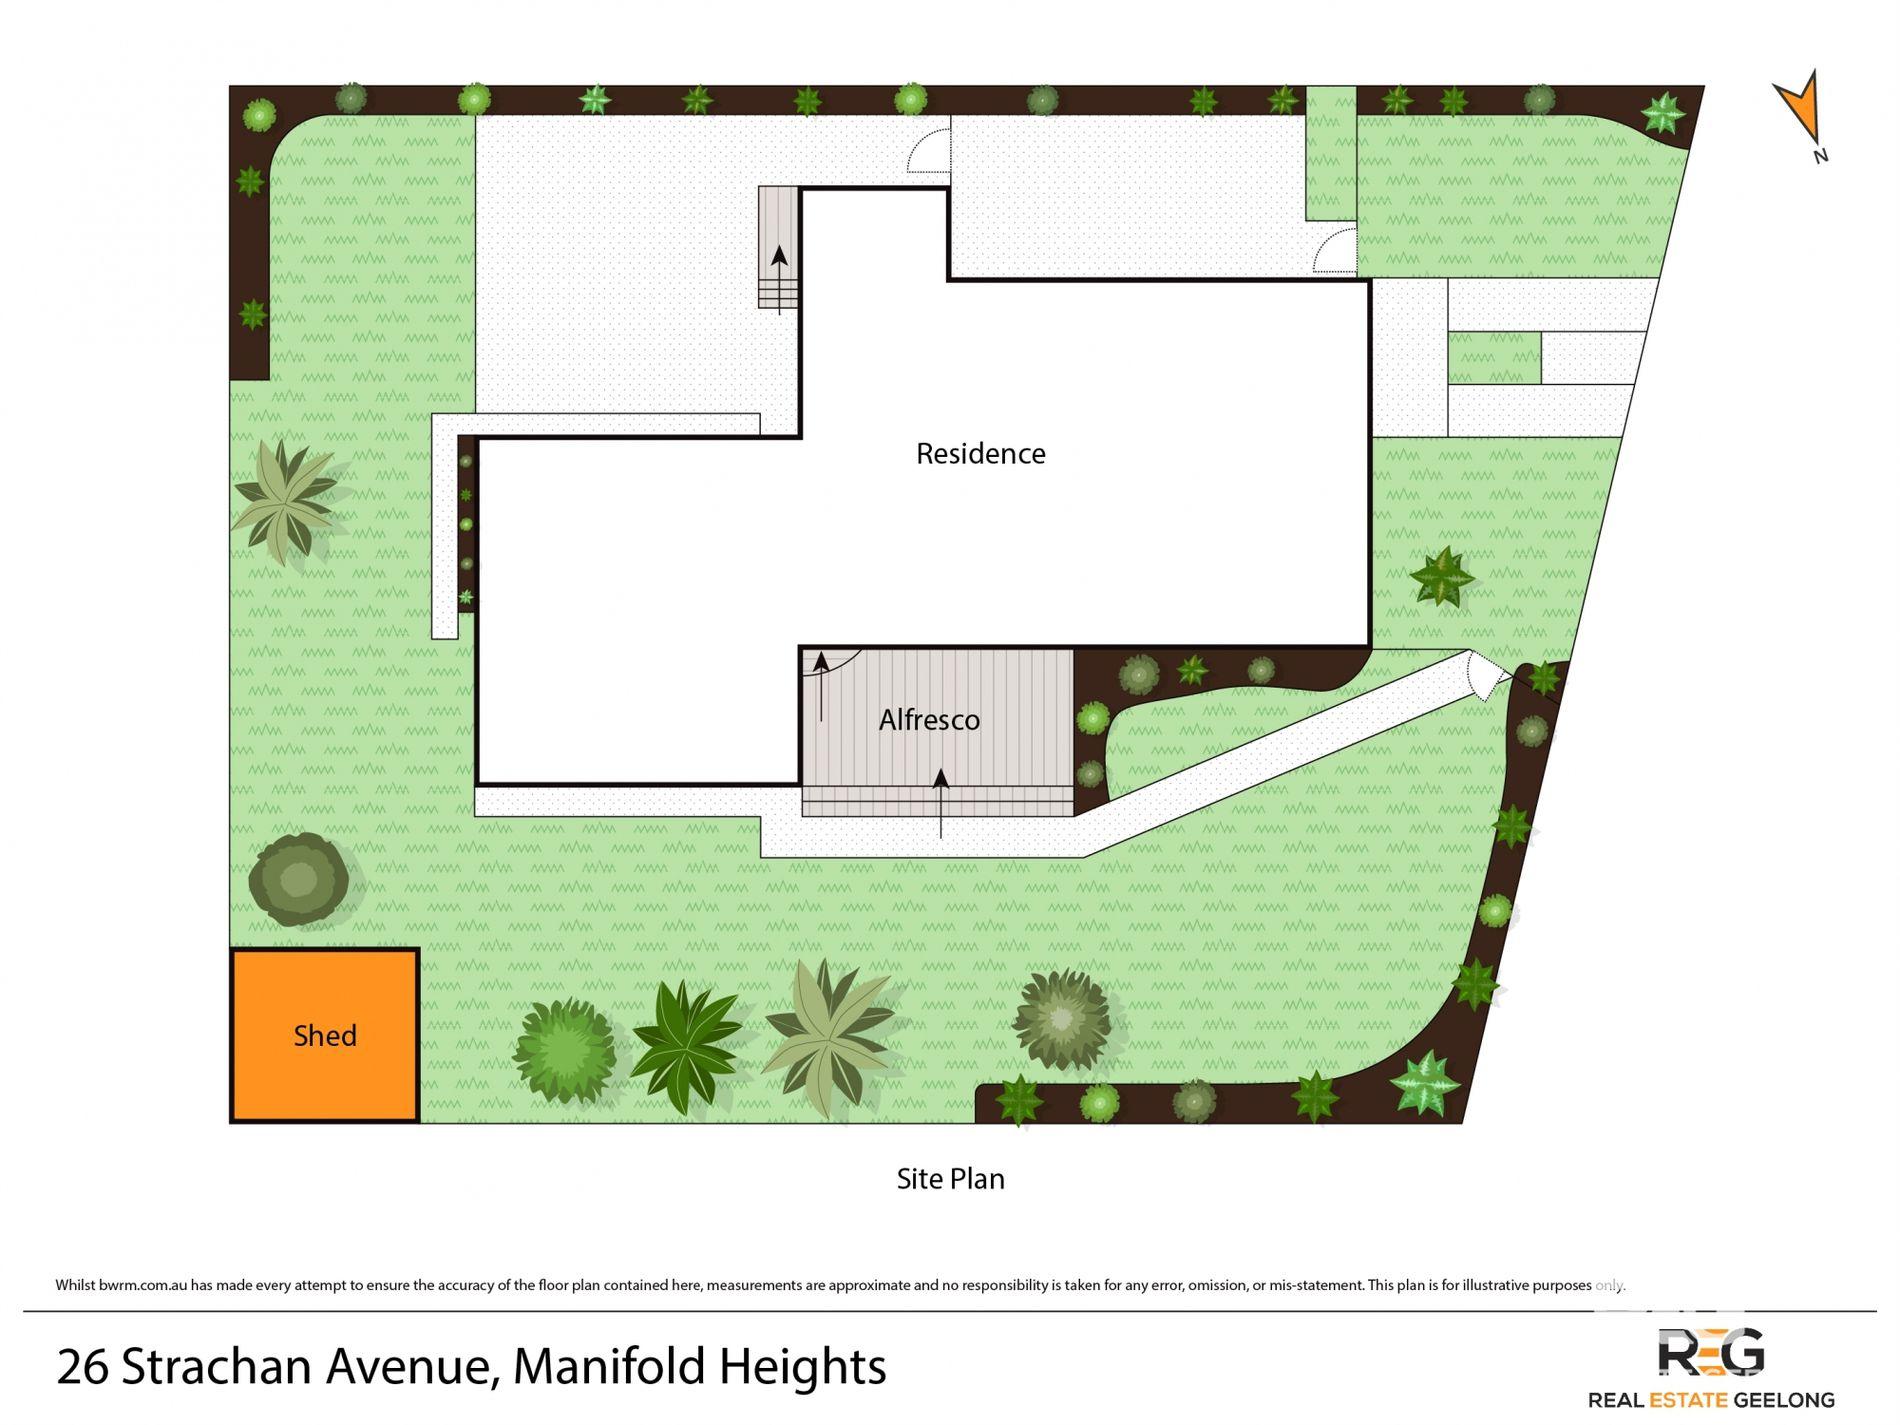 26 STRACHAN AVENUE, Manifold Heights